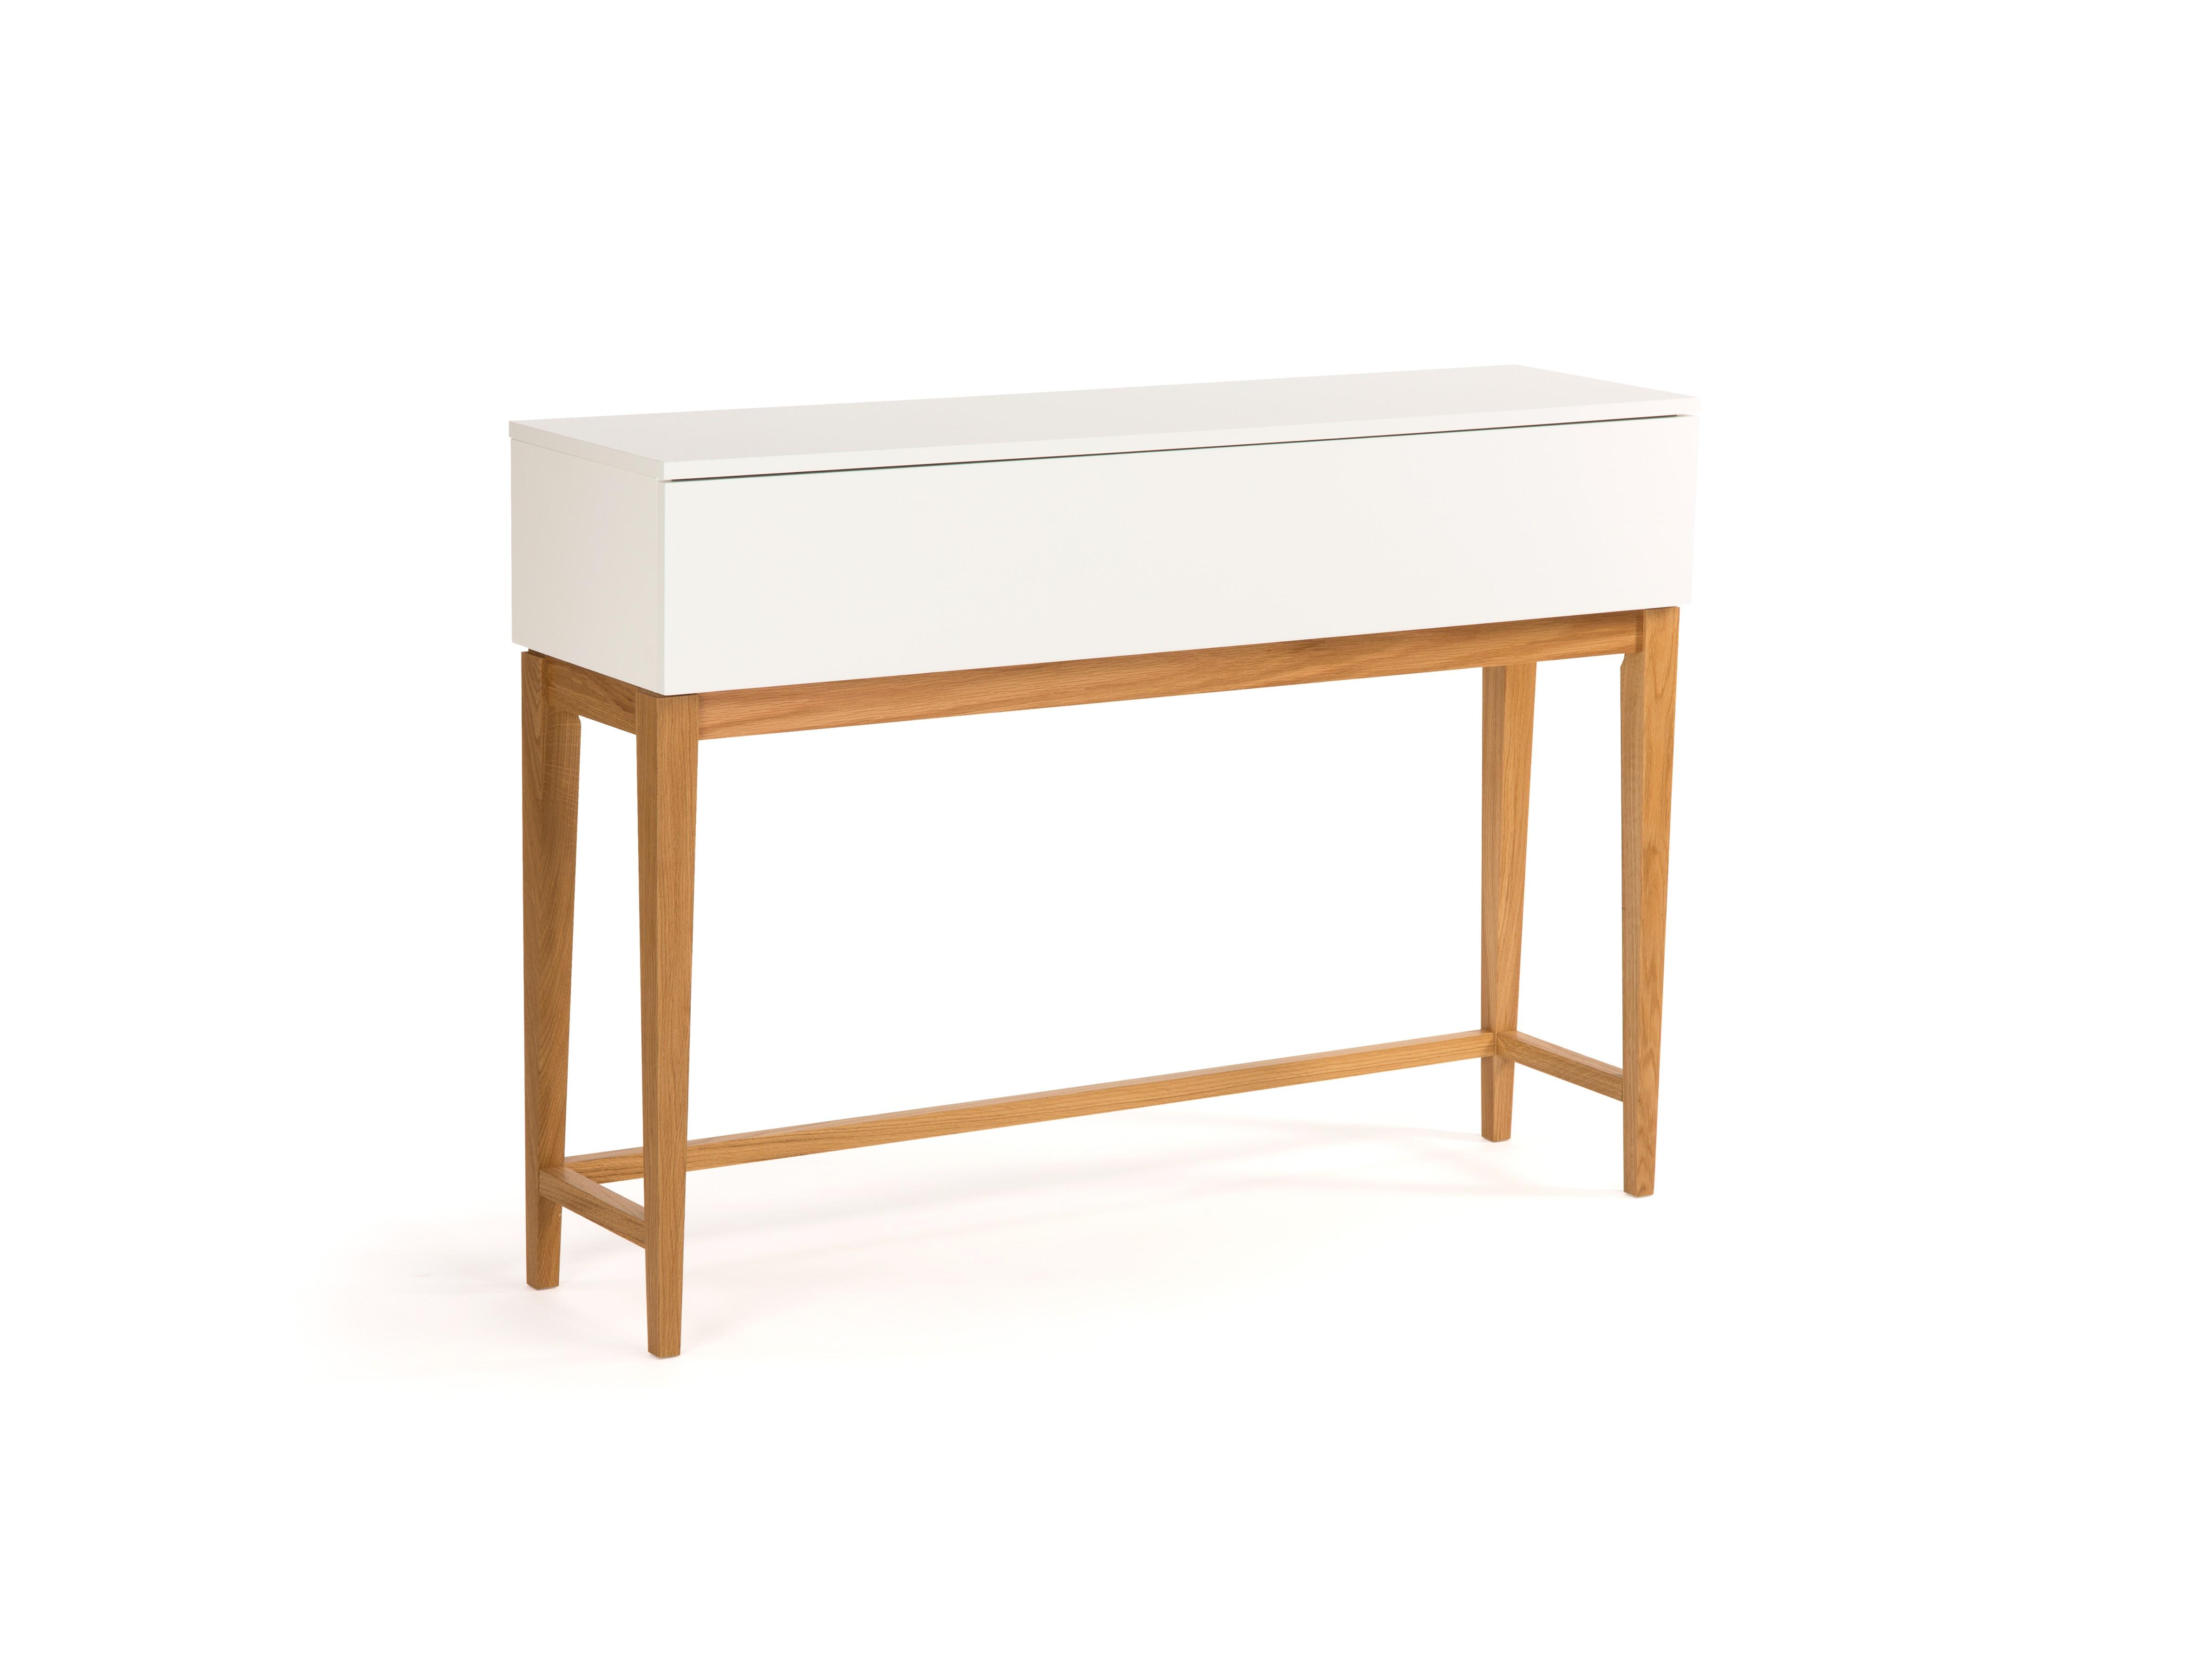 123217008012 Blanco Console Table 01